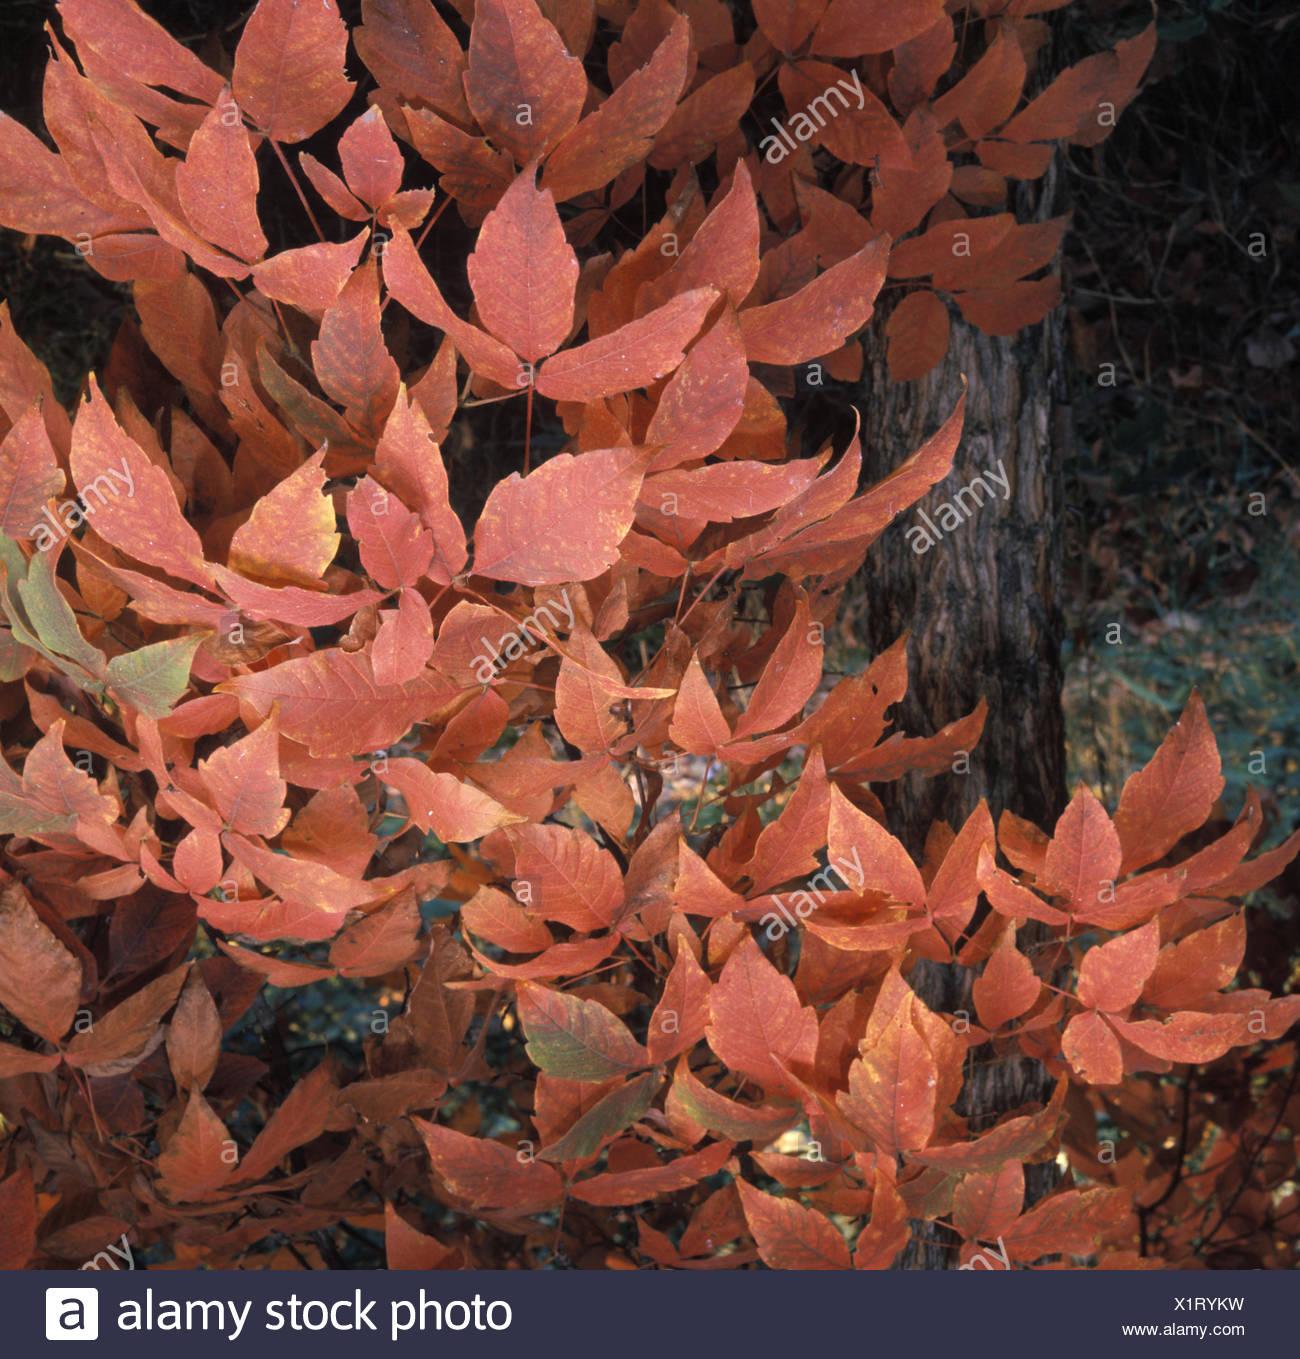 Acer triflorum    Ref: UMW_118361_0005 - Stock Image